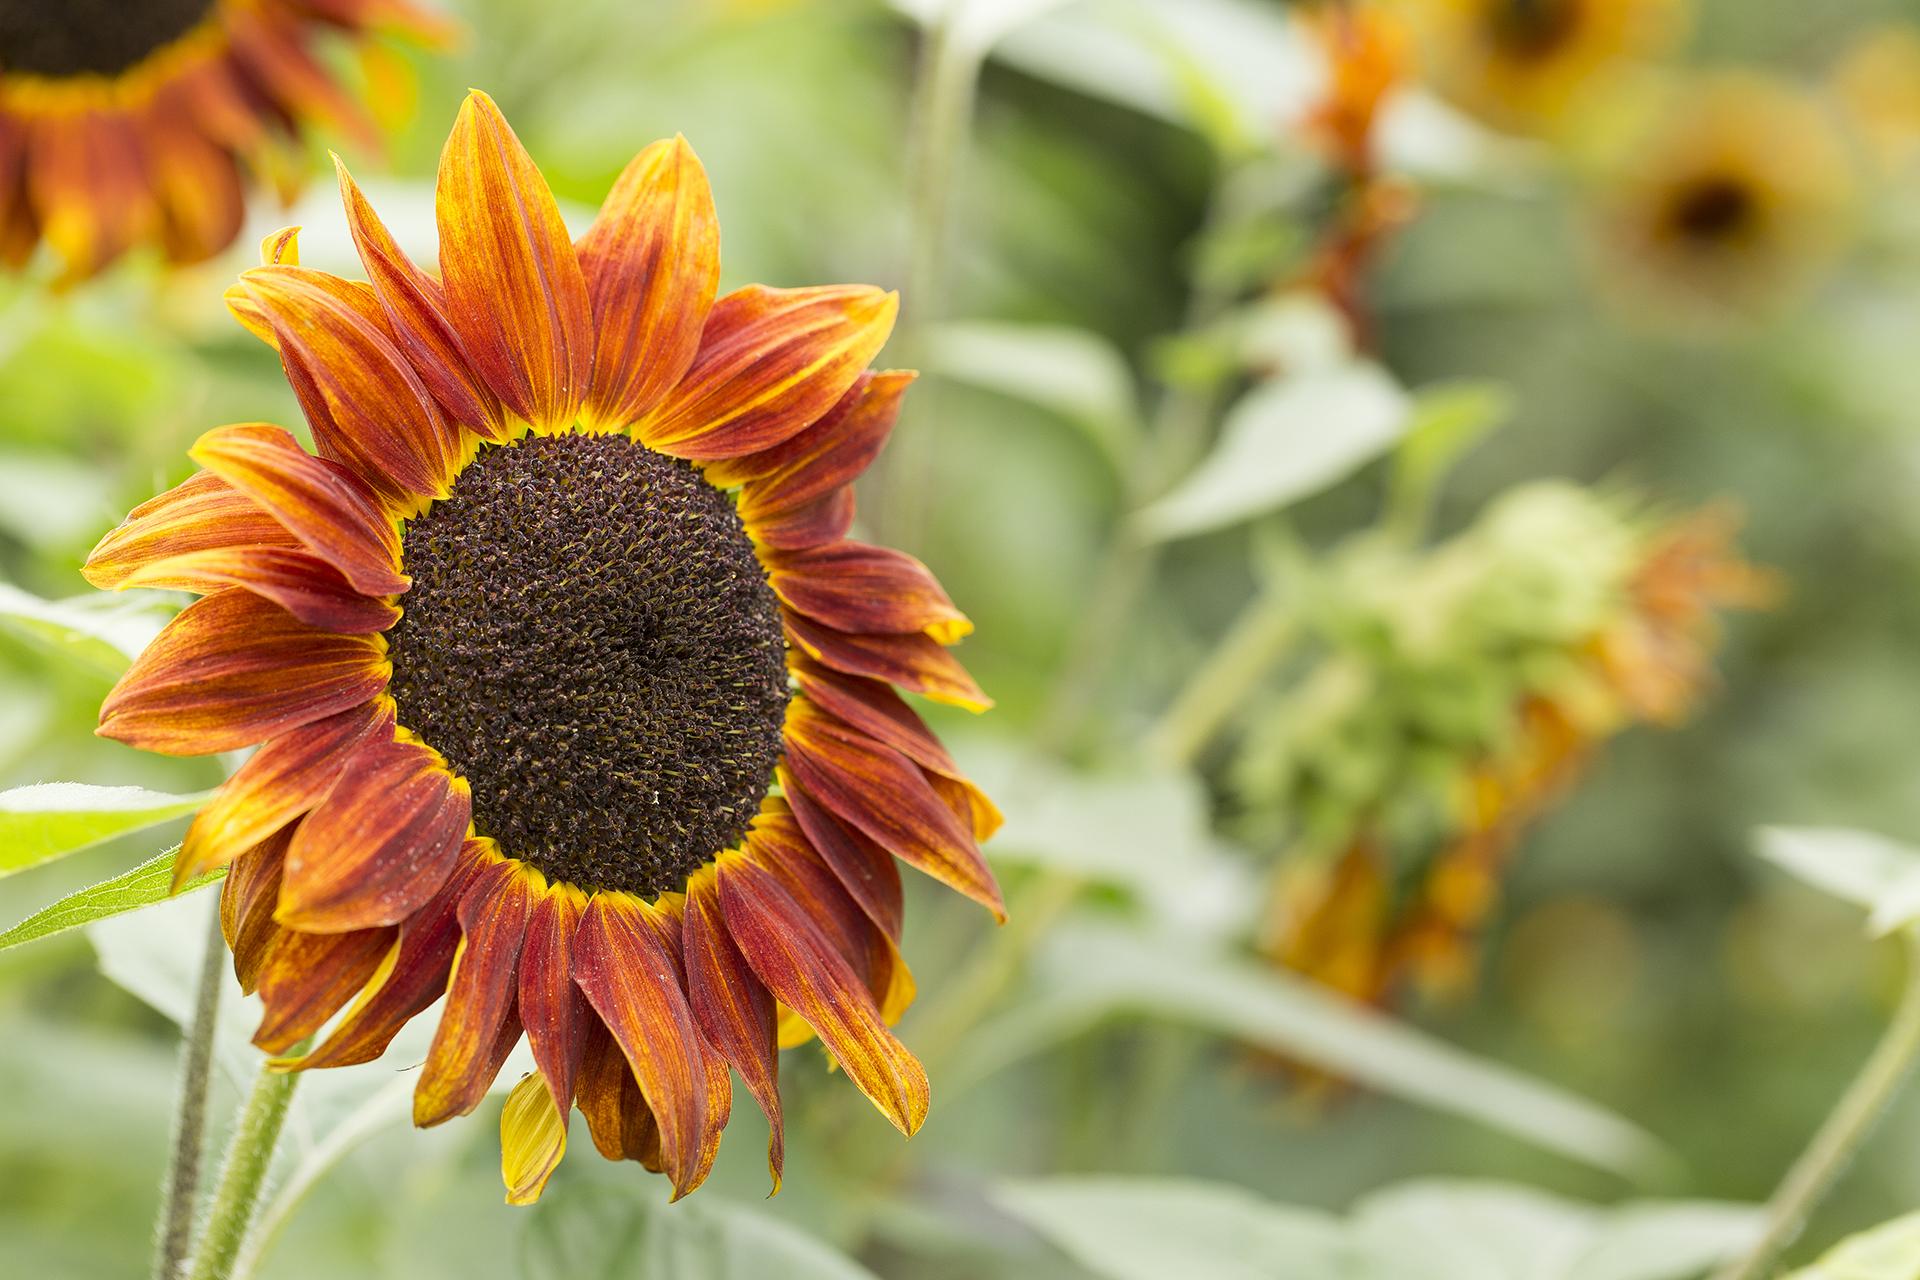 Sunflower in The Ridgeline Trust Garden, Reading